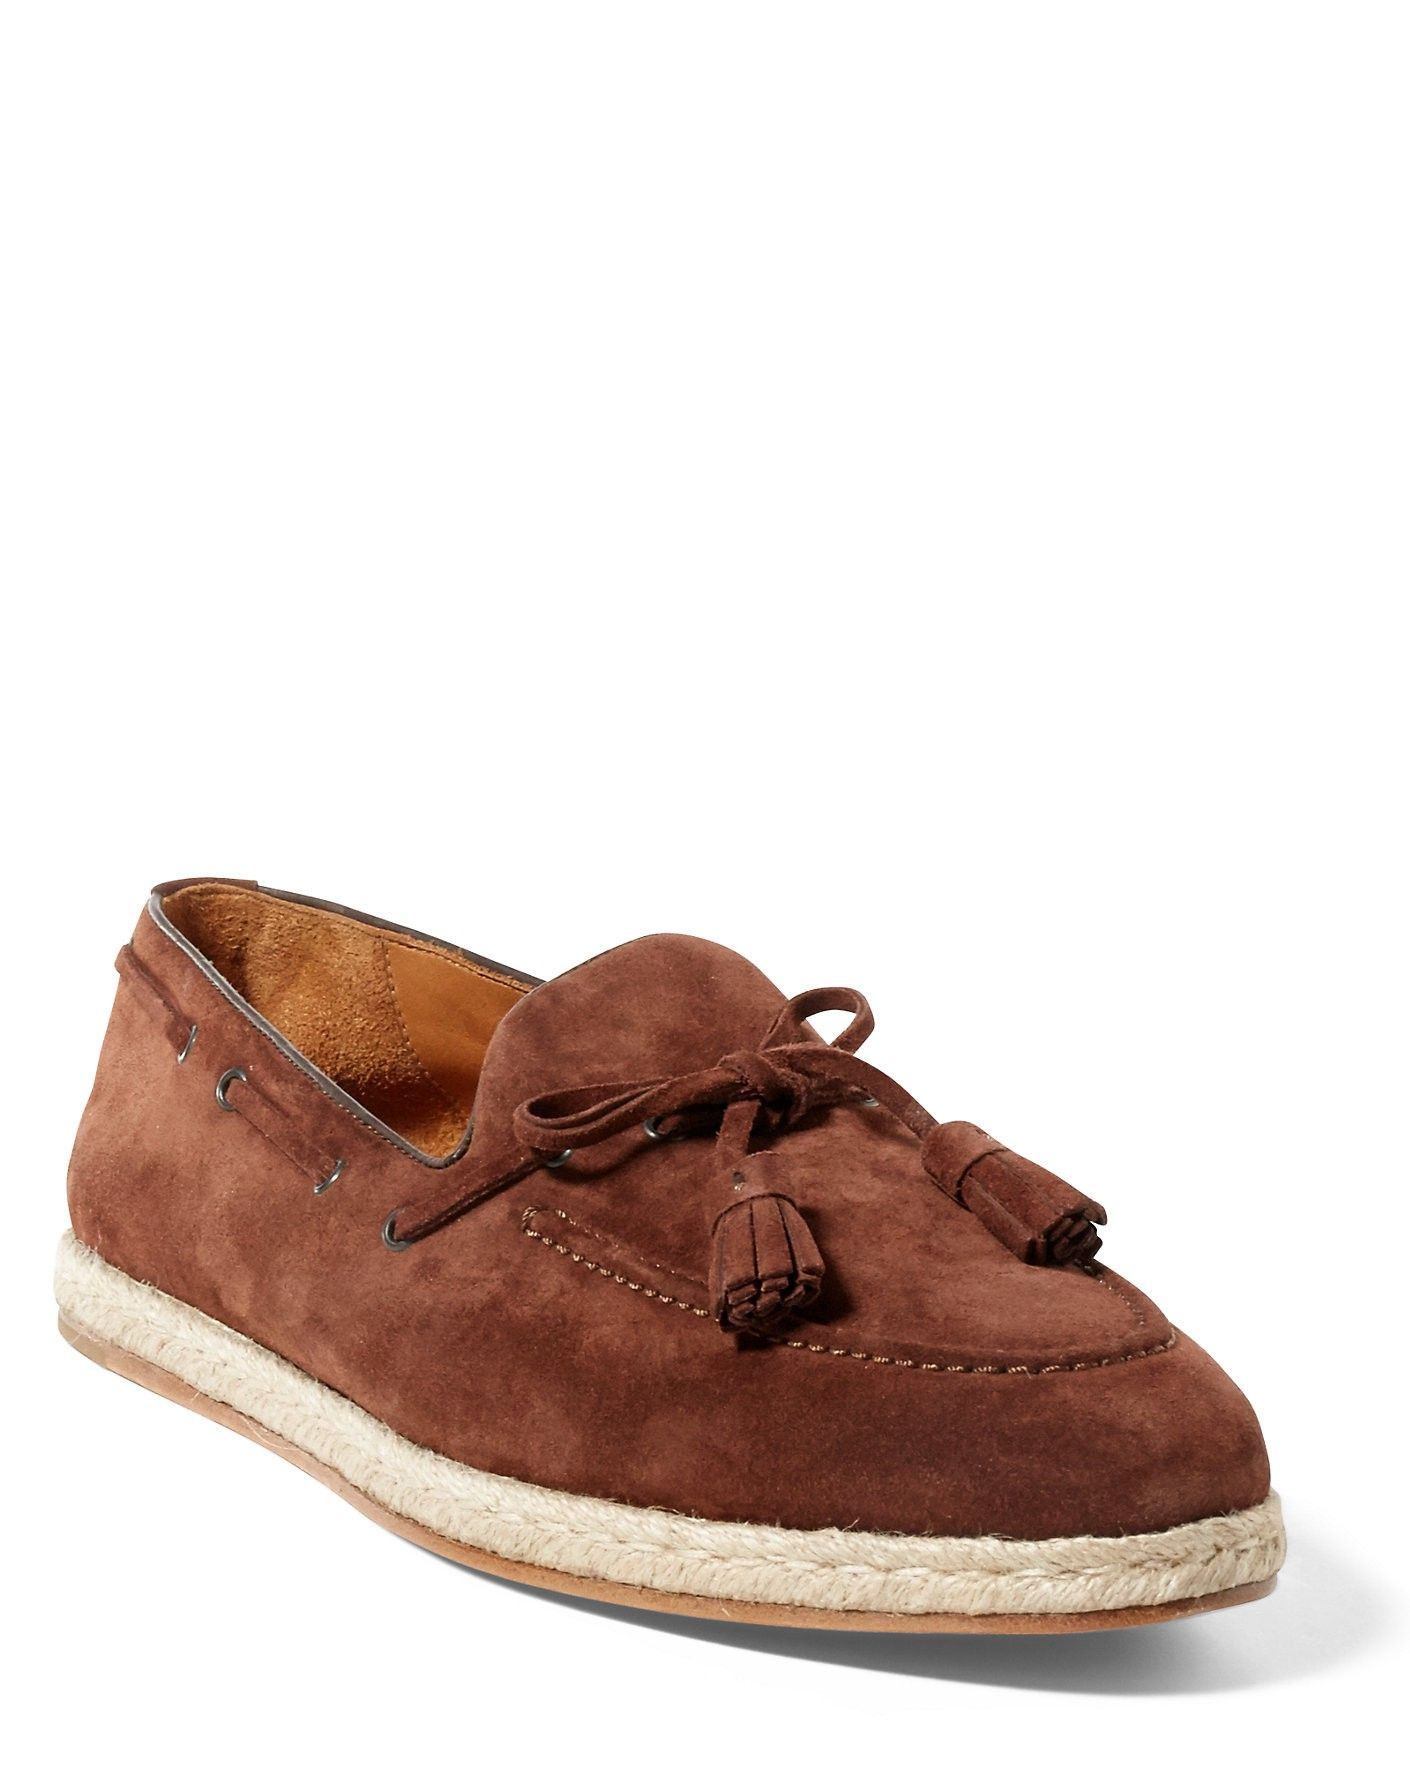 RALPH LAUREN Chessington Suede Loafer. #ralphlauren #shoes #all